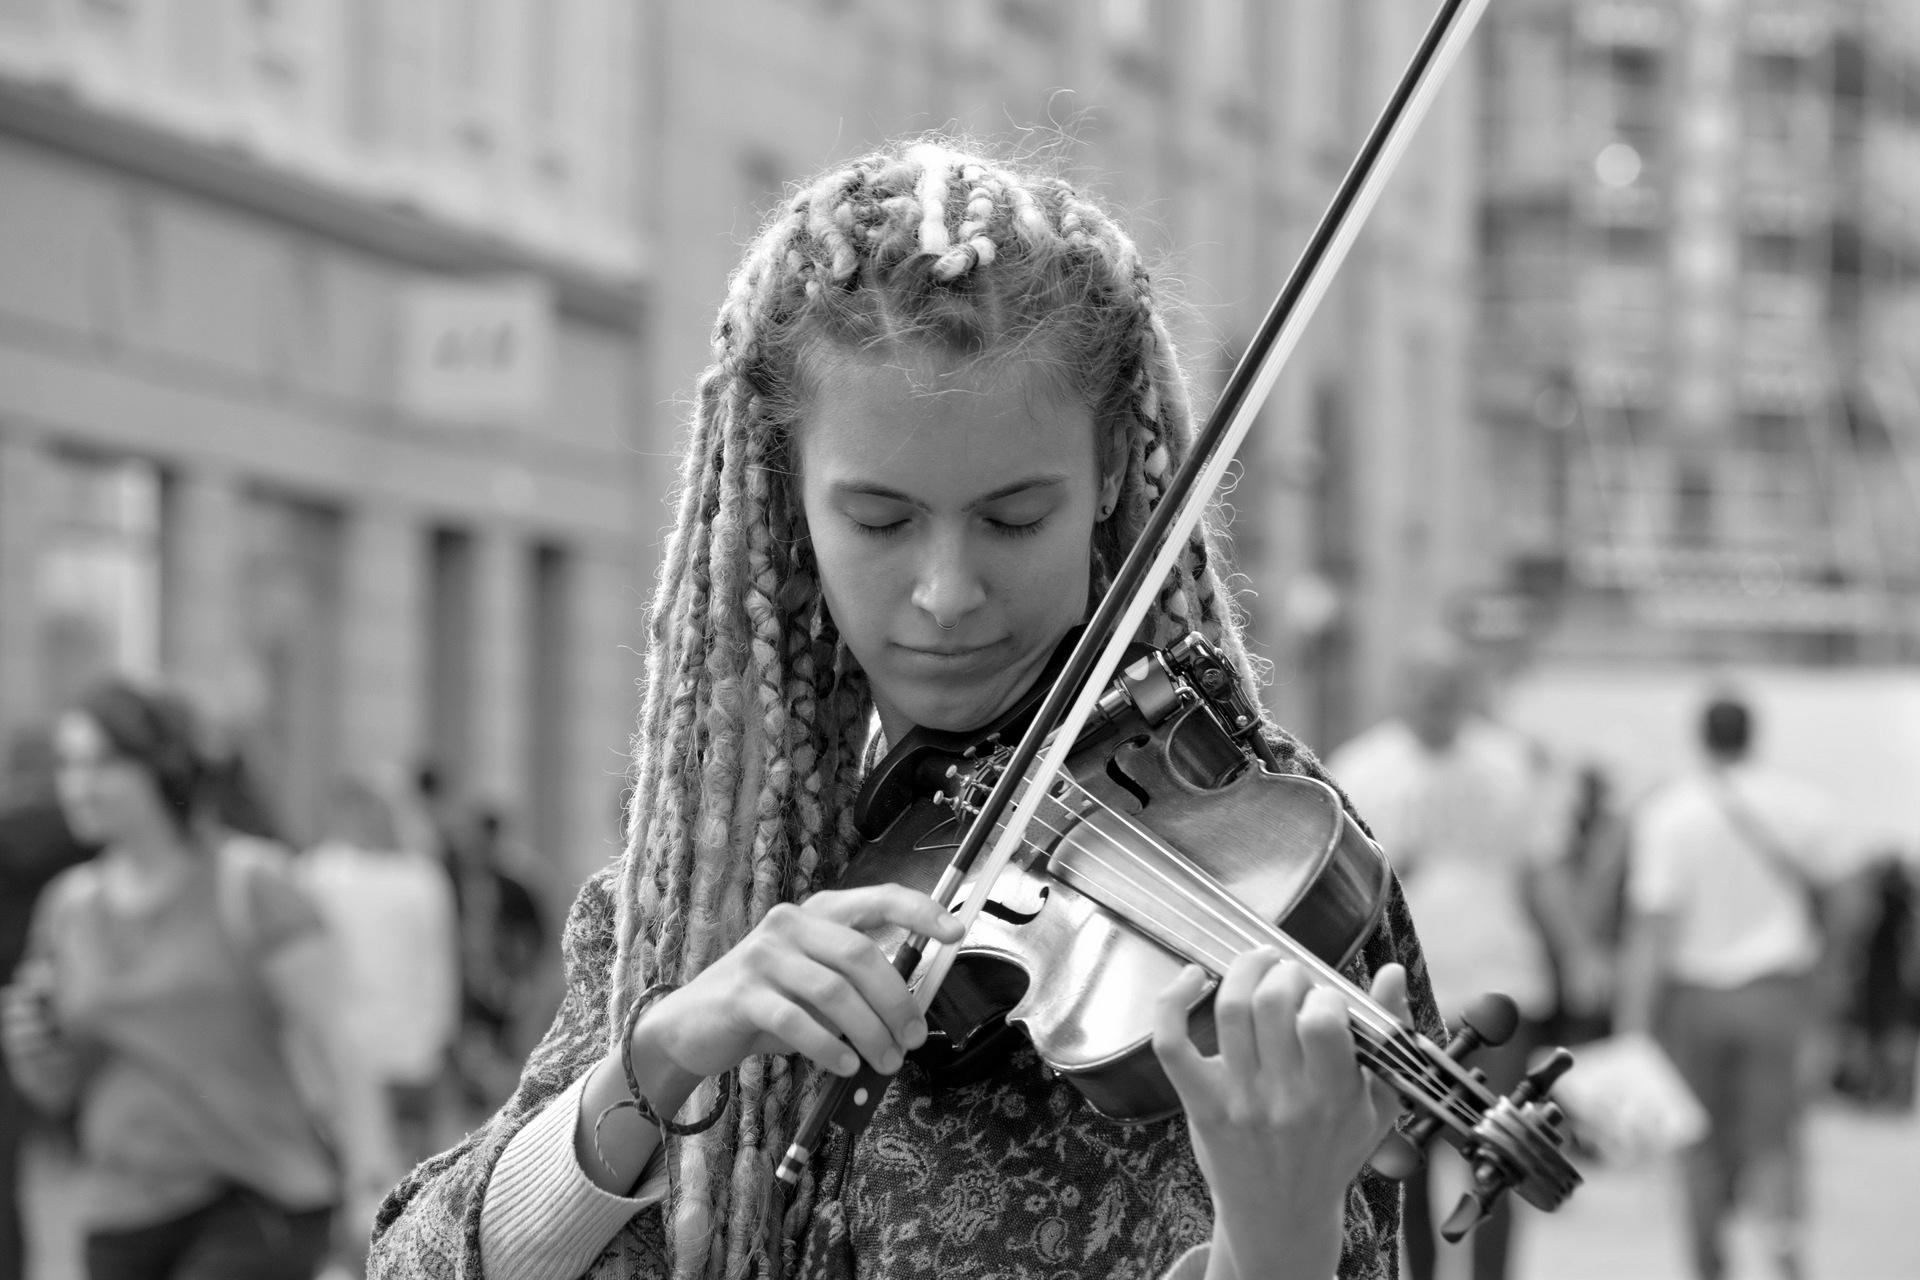 Assumed_283_Street Musician.jpg